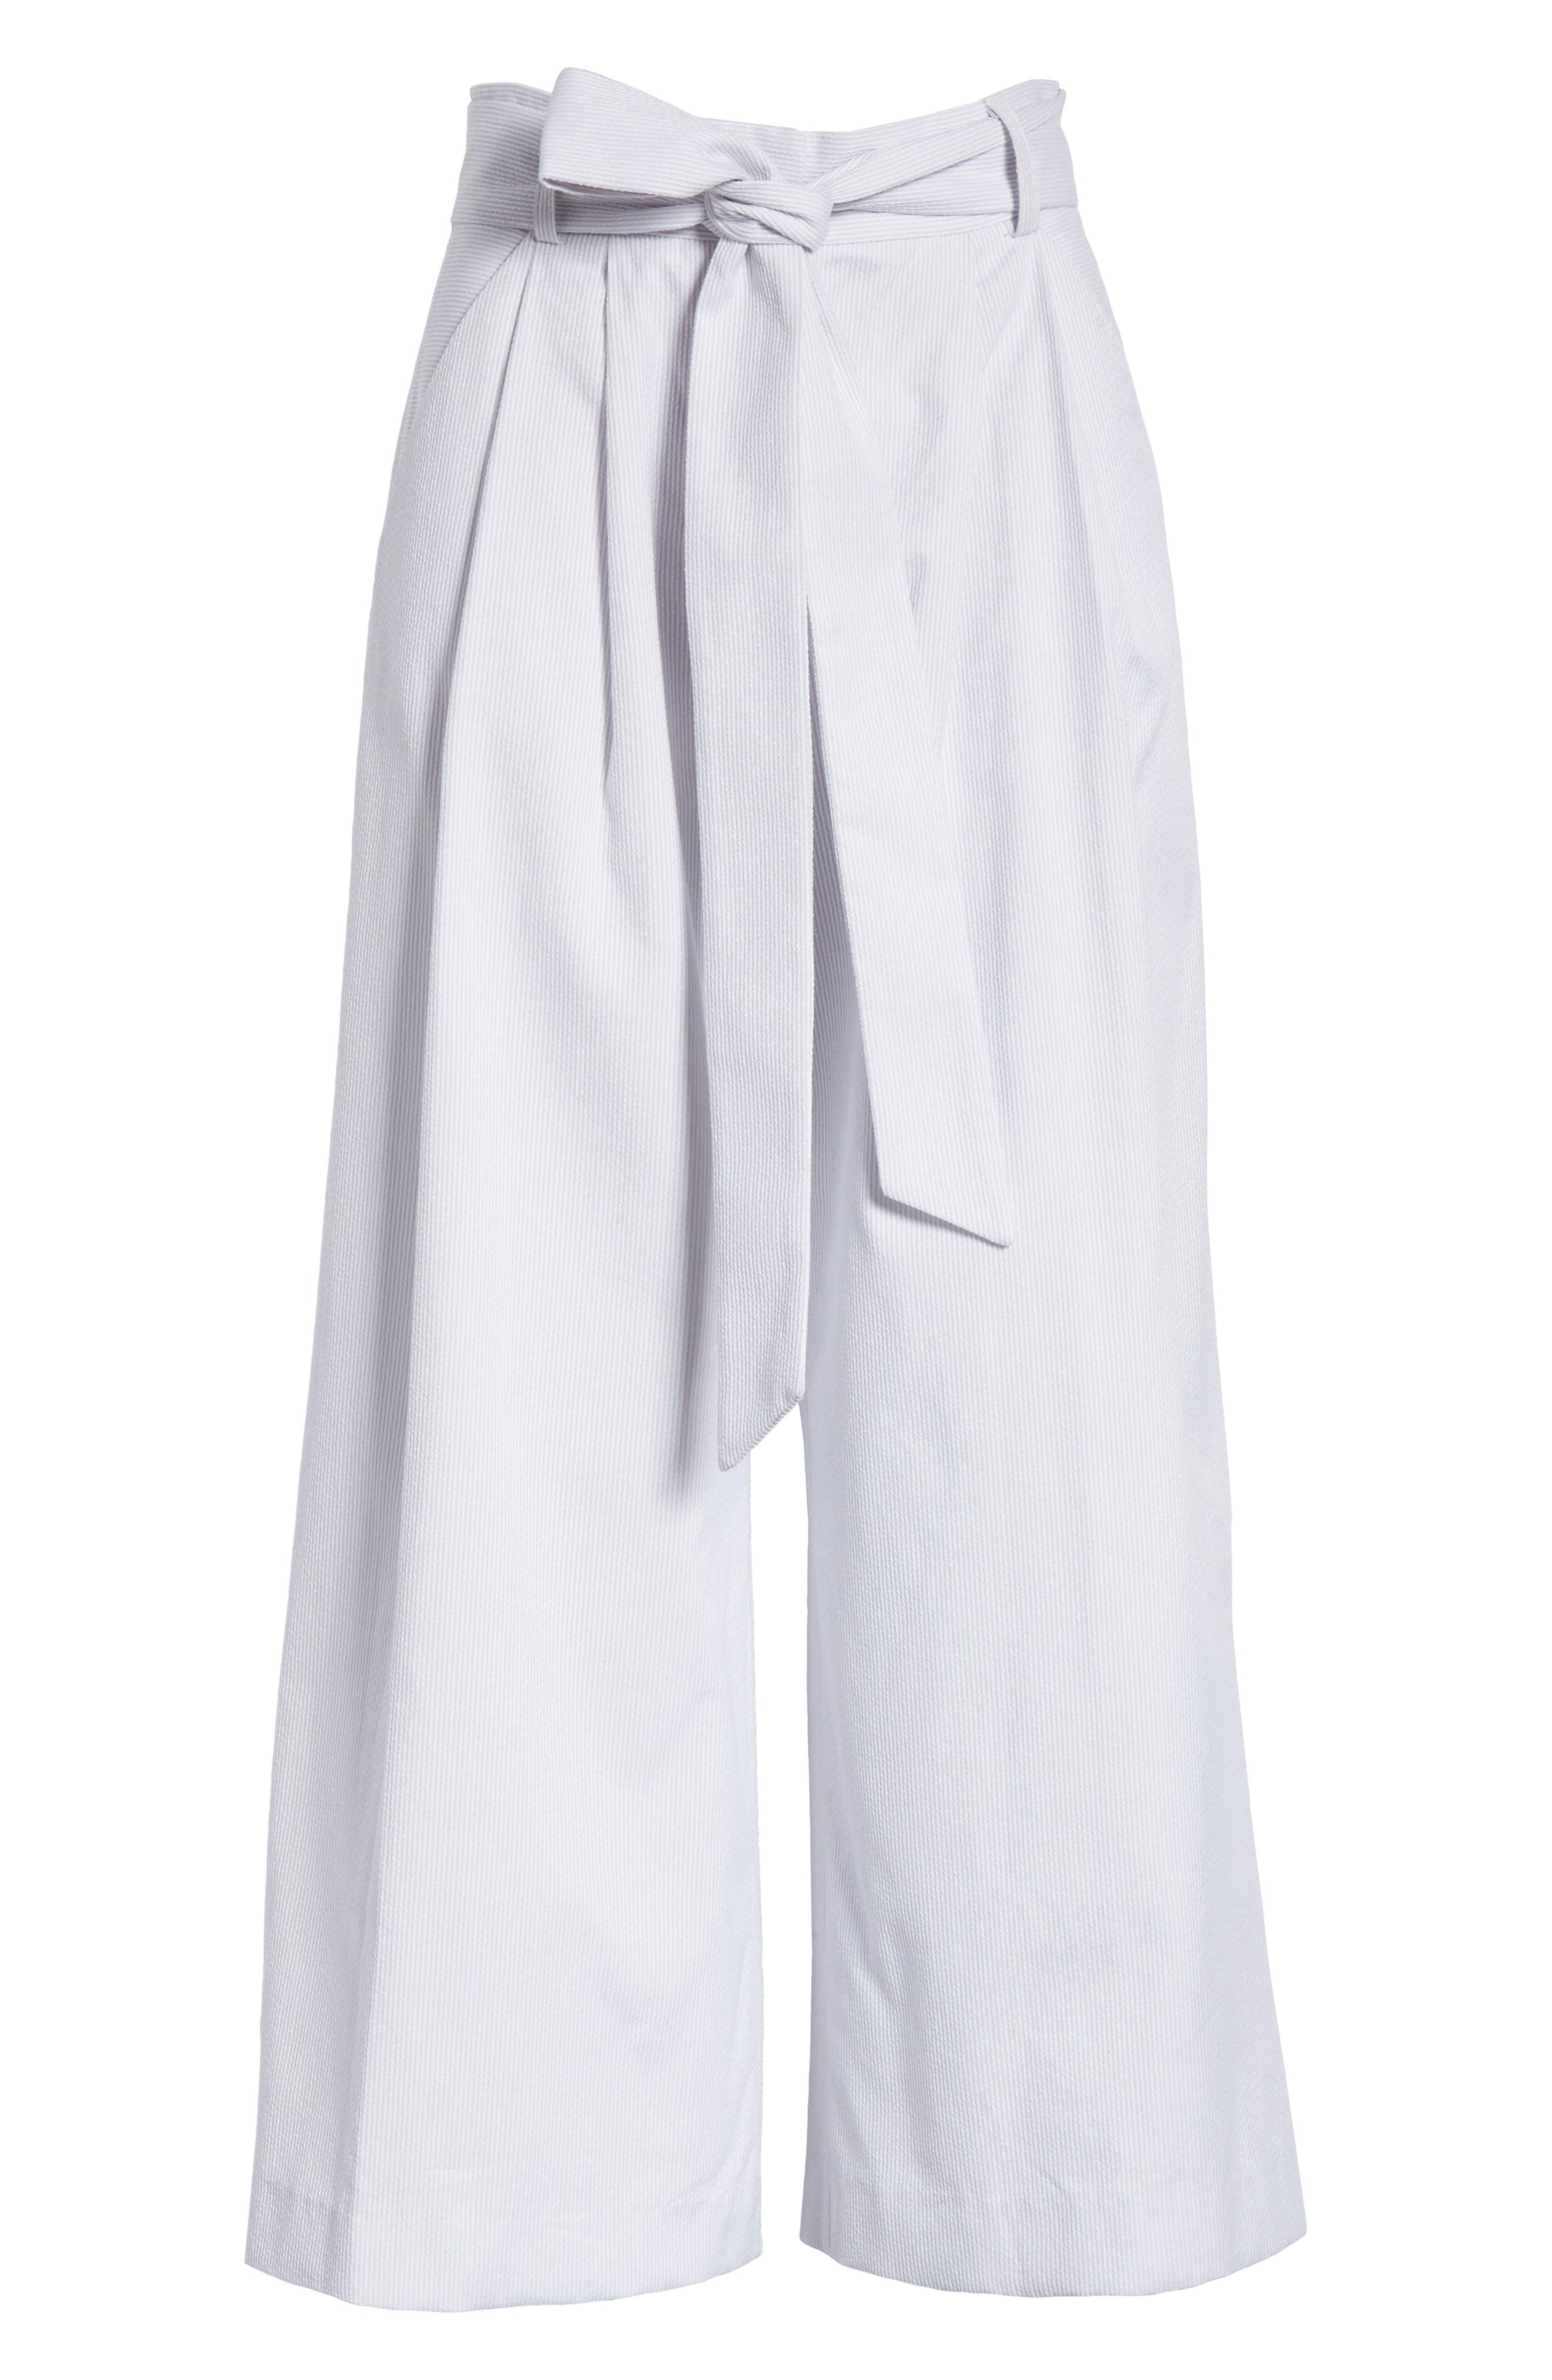 Natalie Crop Tie Waist Pants,                             Alternate thumbnail 7, color,                             Grey